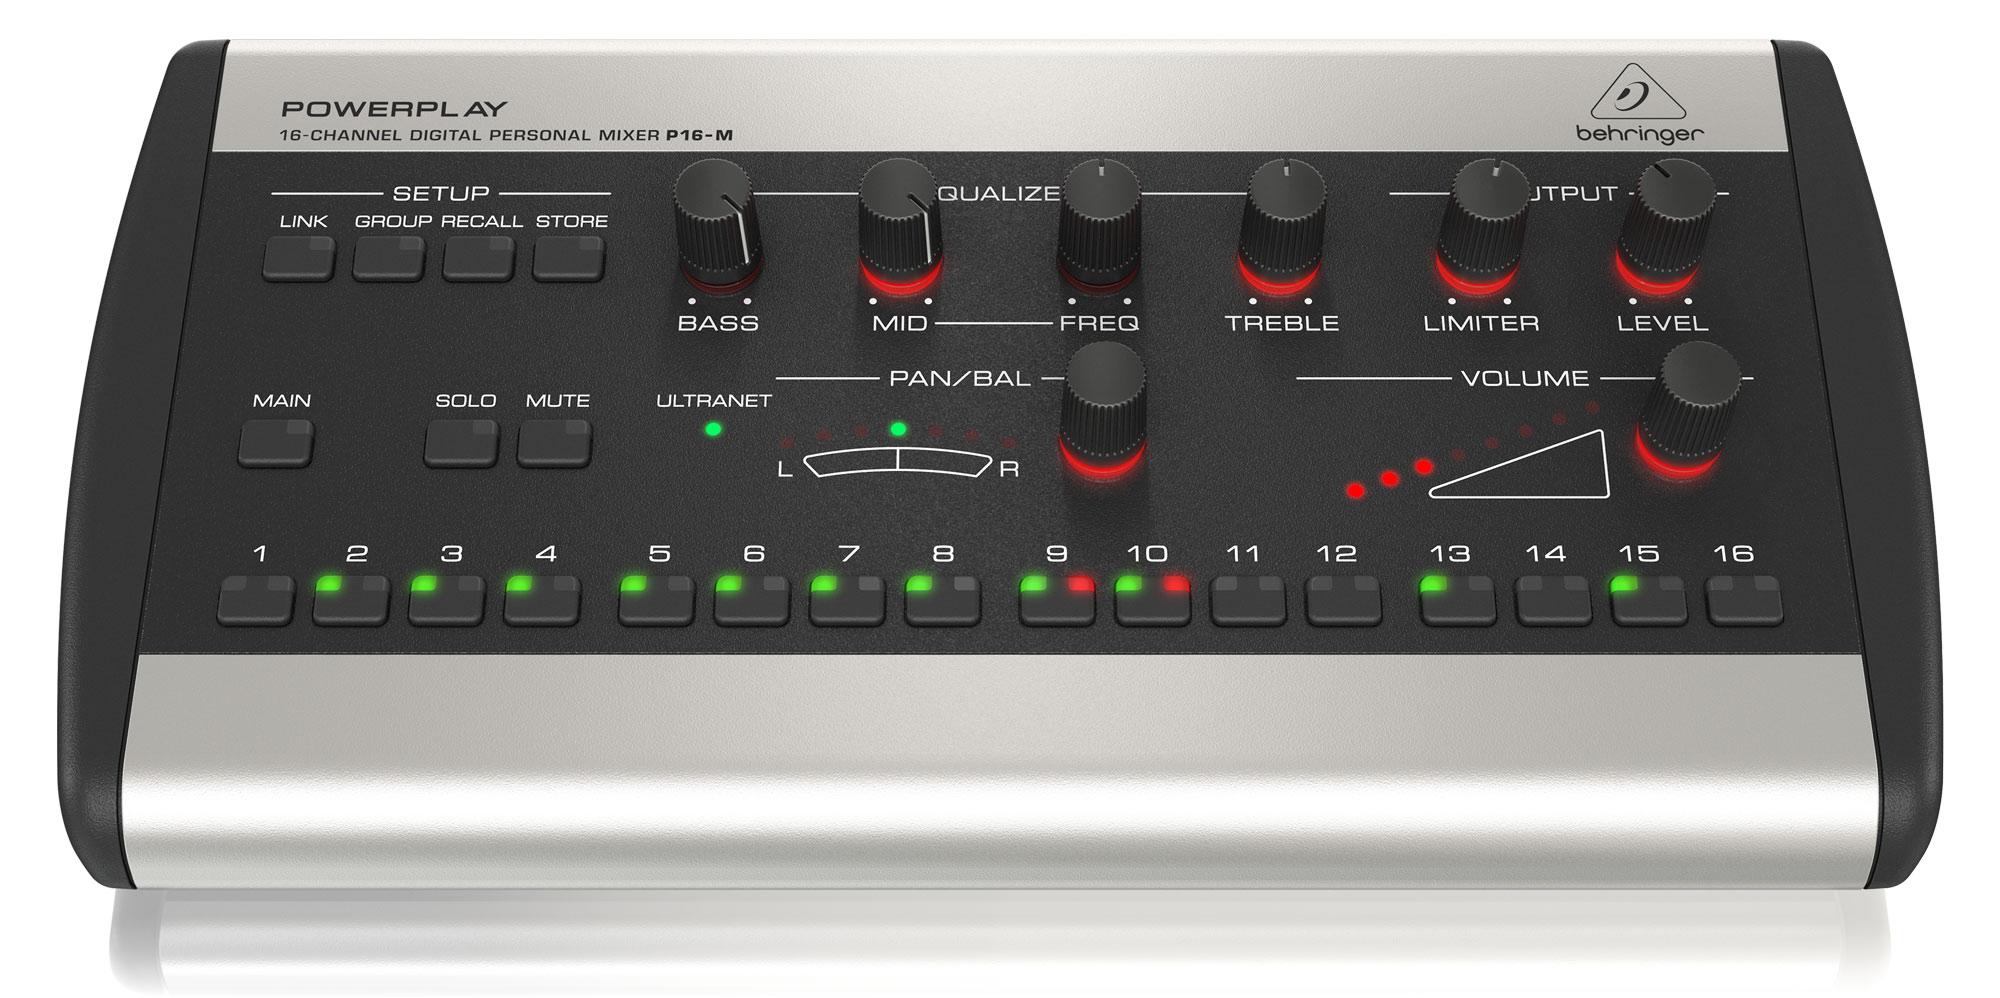 Behringer Powerplay P16 M Personal Mixer